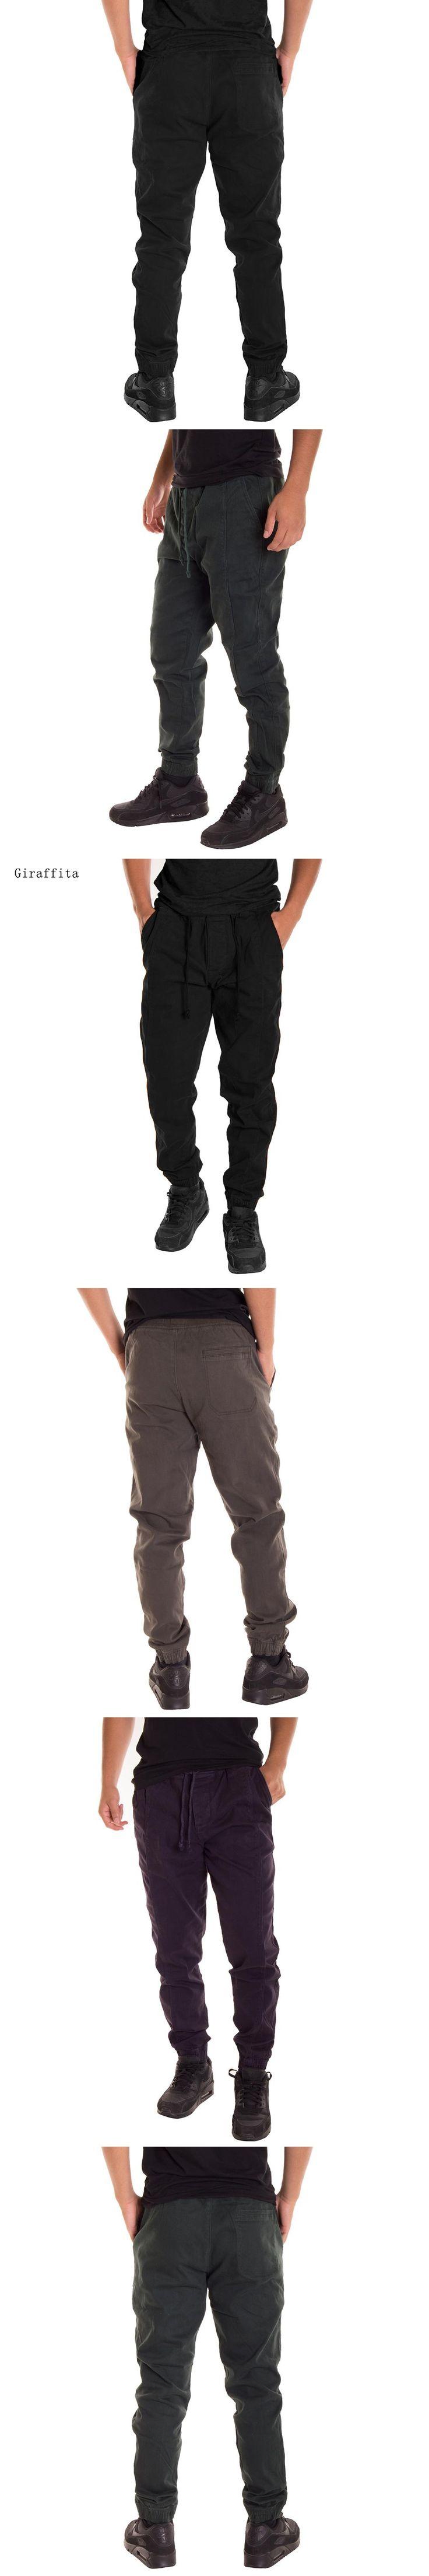 Giraffita Men Autumn Pants Casual Elastic Cotton Mens Workout Pants Sweatpants Trousers Elastic Drawstring Pants